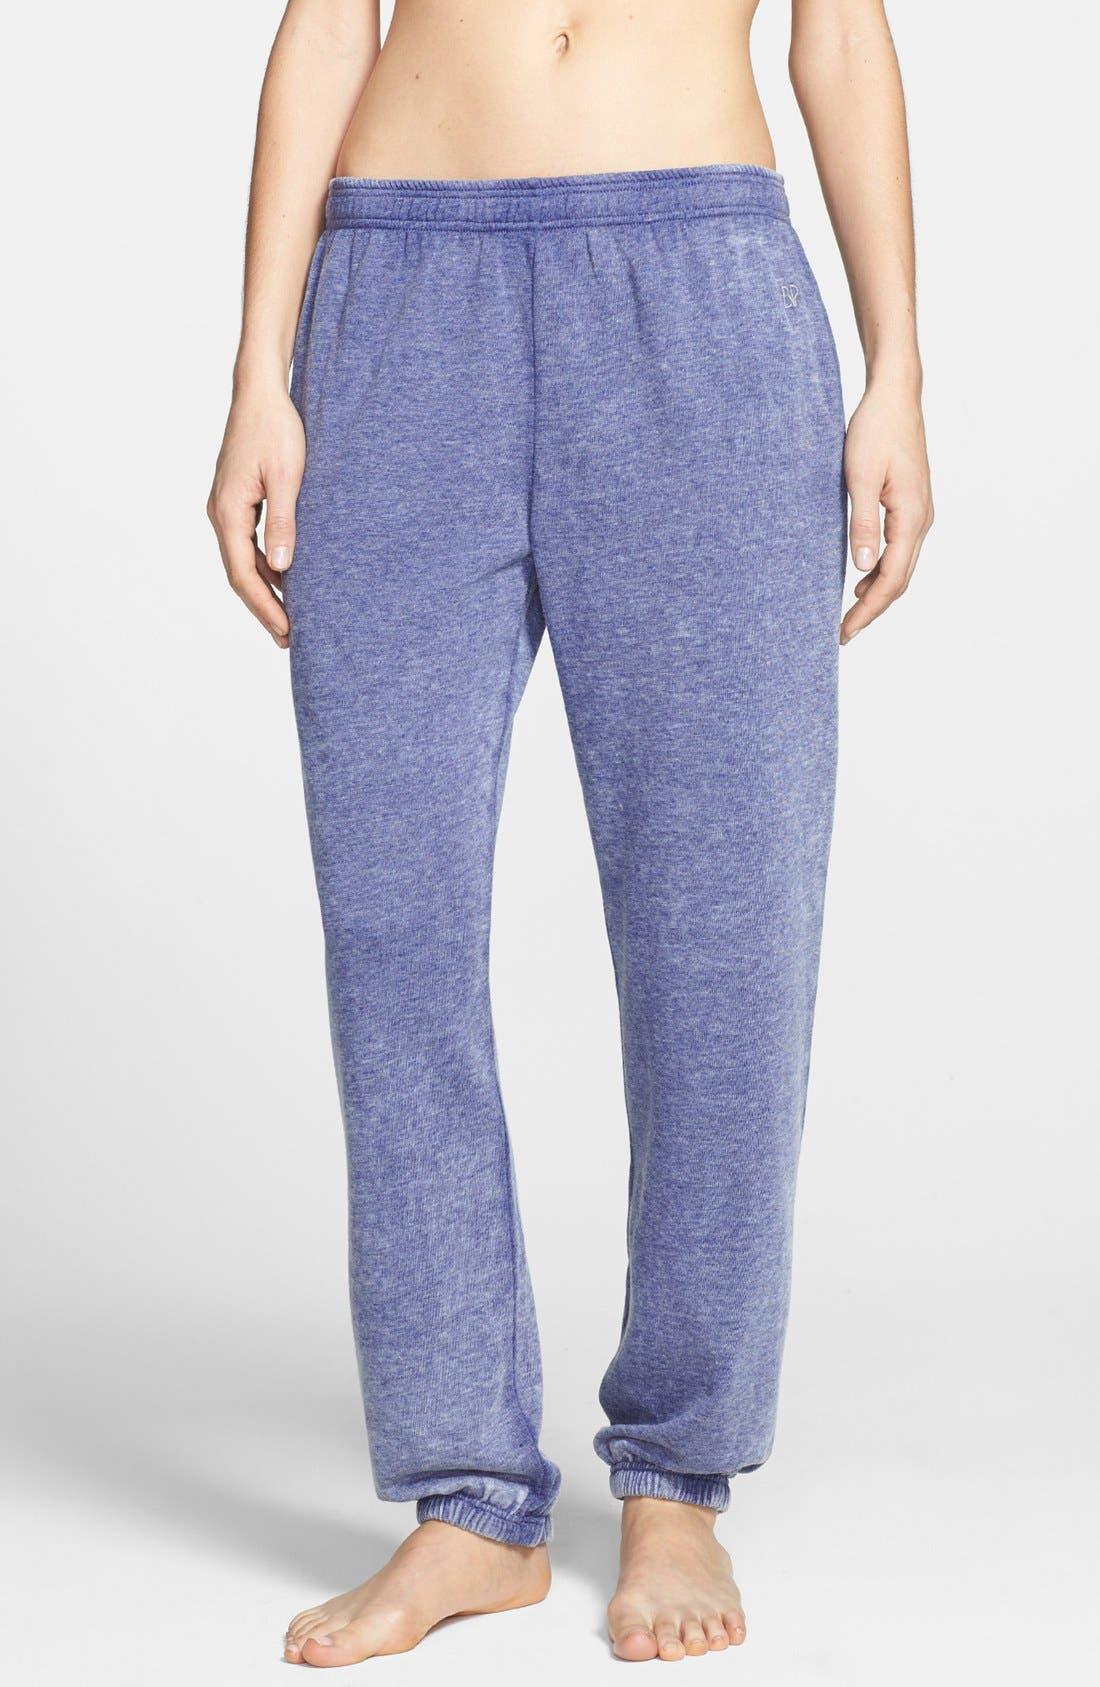 Alternate Image 1 Selected - BP. Undercover 'Gym Class' Sweatpants (Juniors)